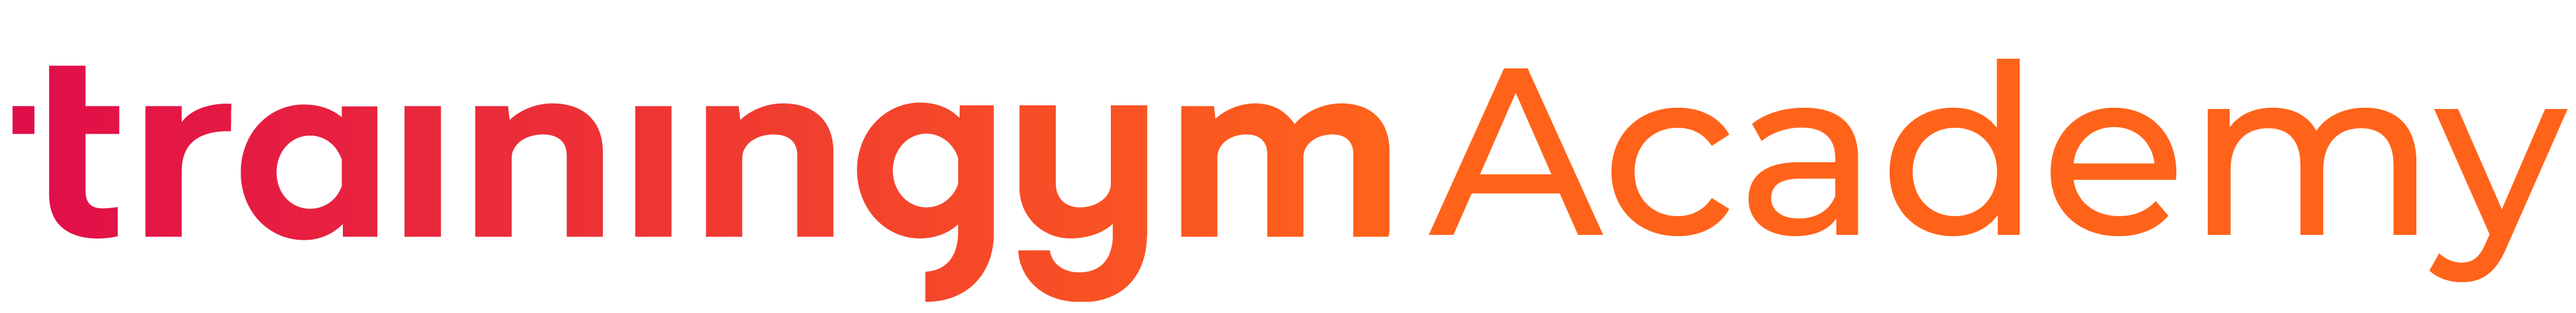 trainingym-academy-logo1-02